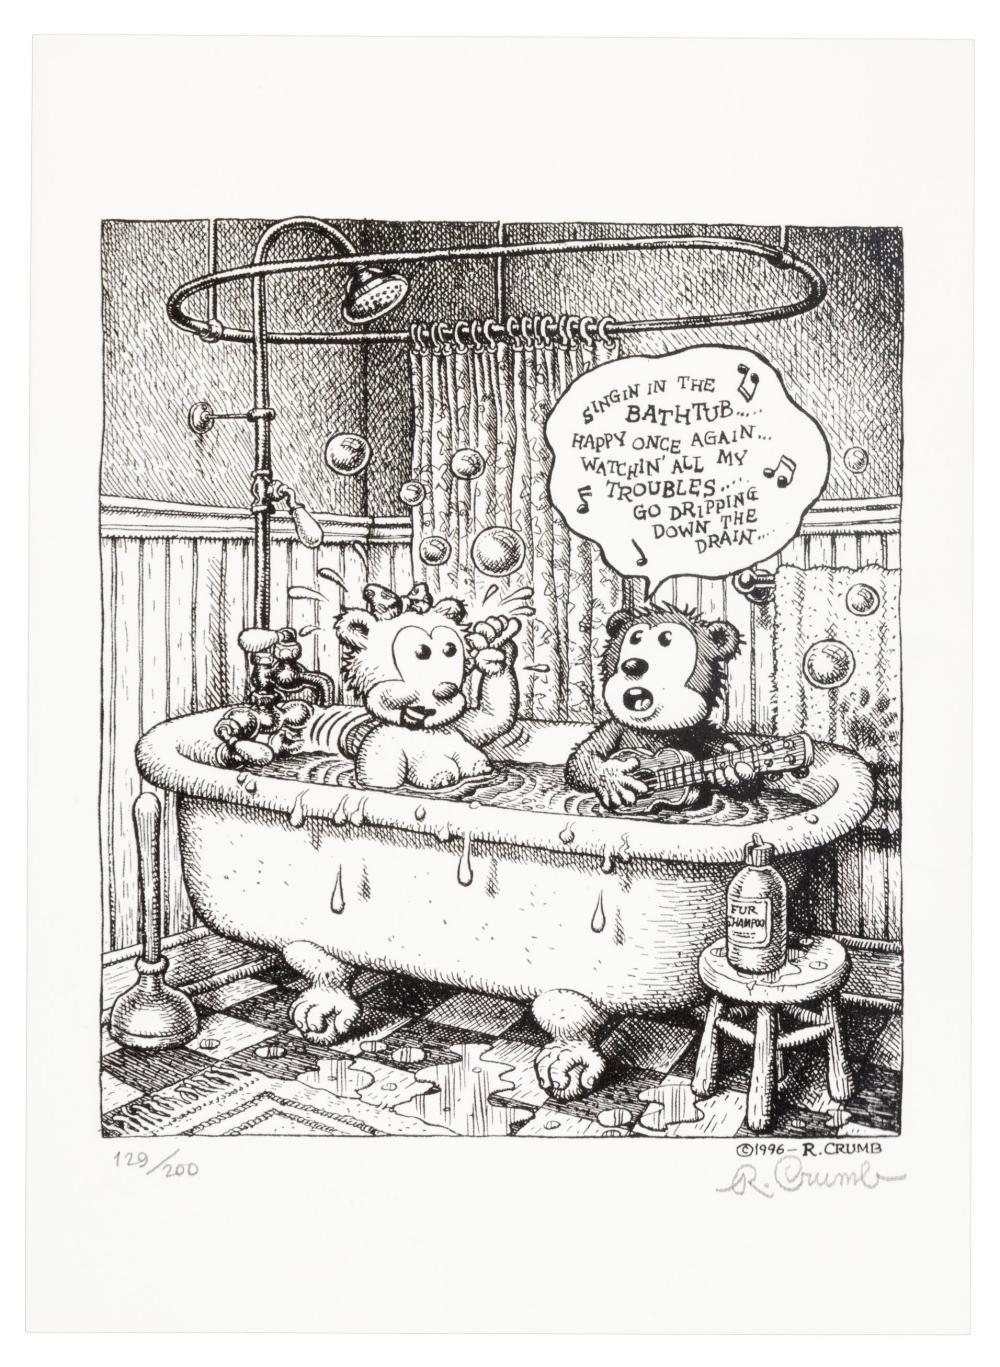 R. CRUMB Bears in the Tub Print Signed Ltd Ed. Print